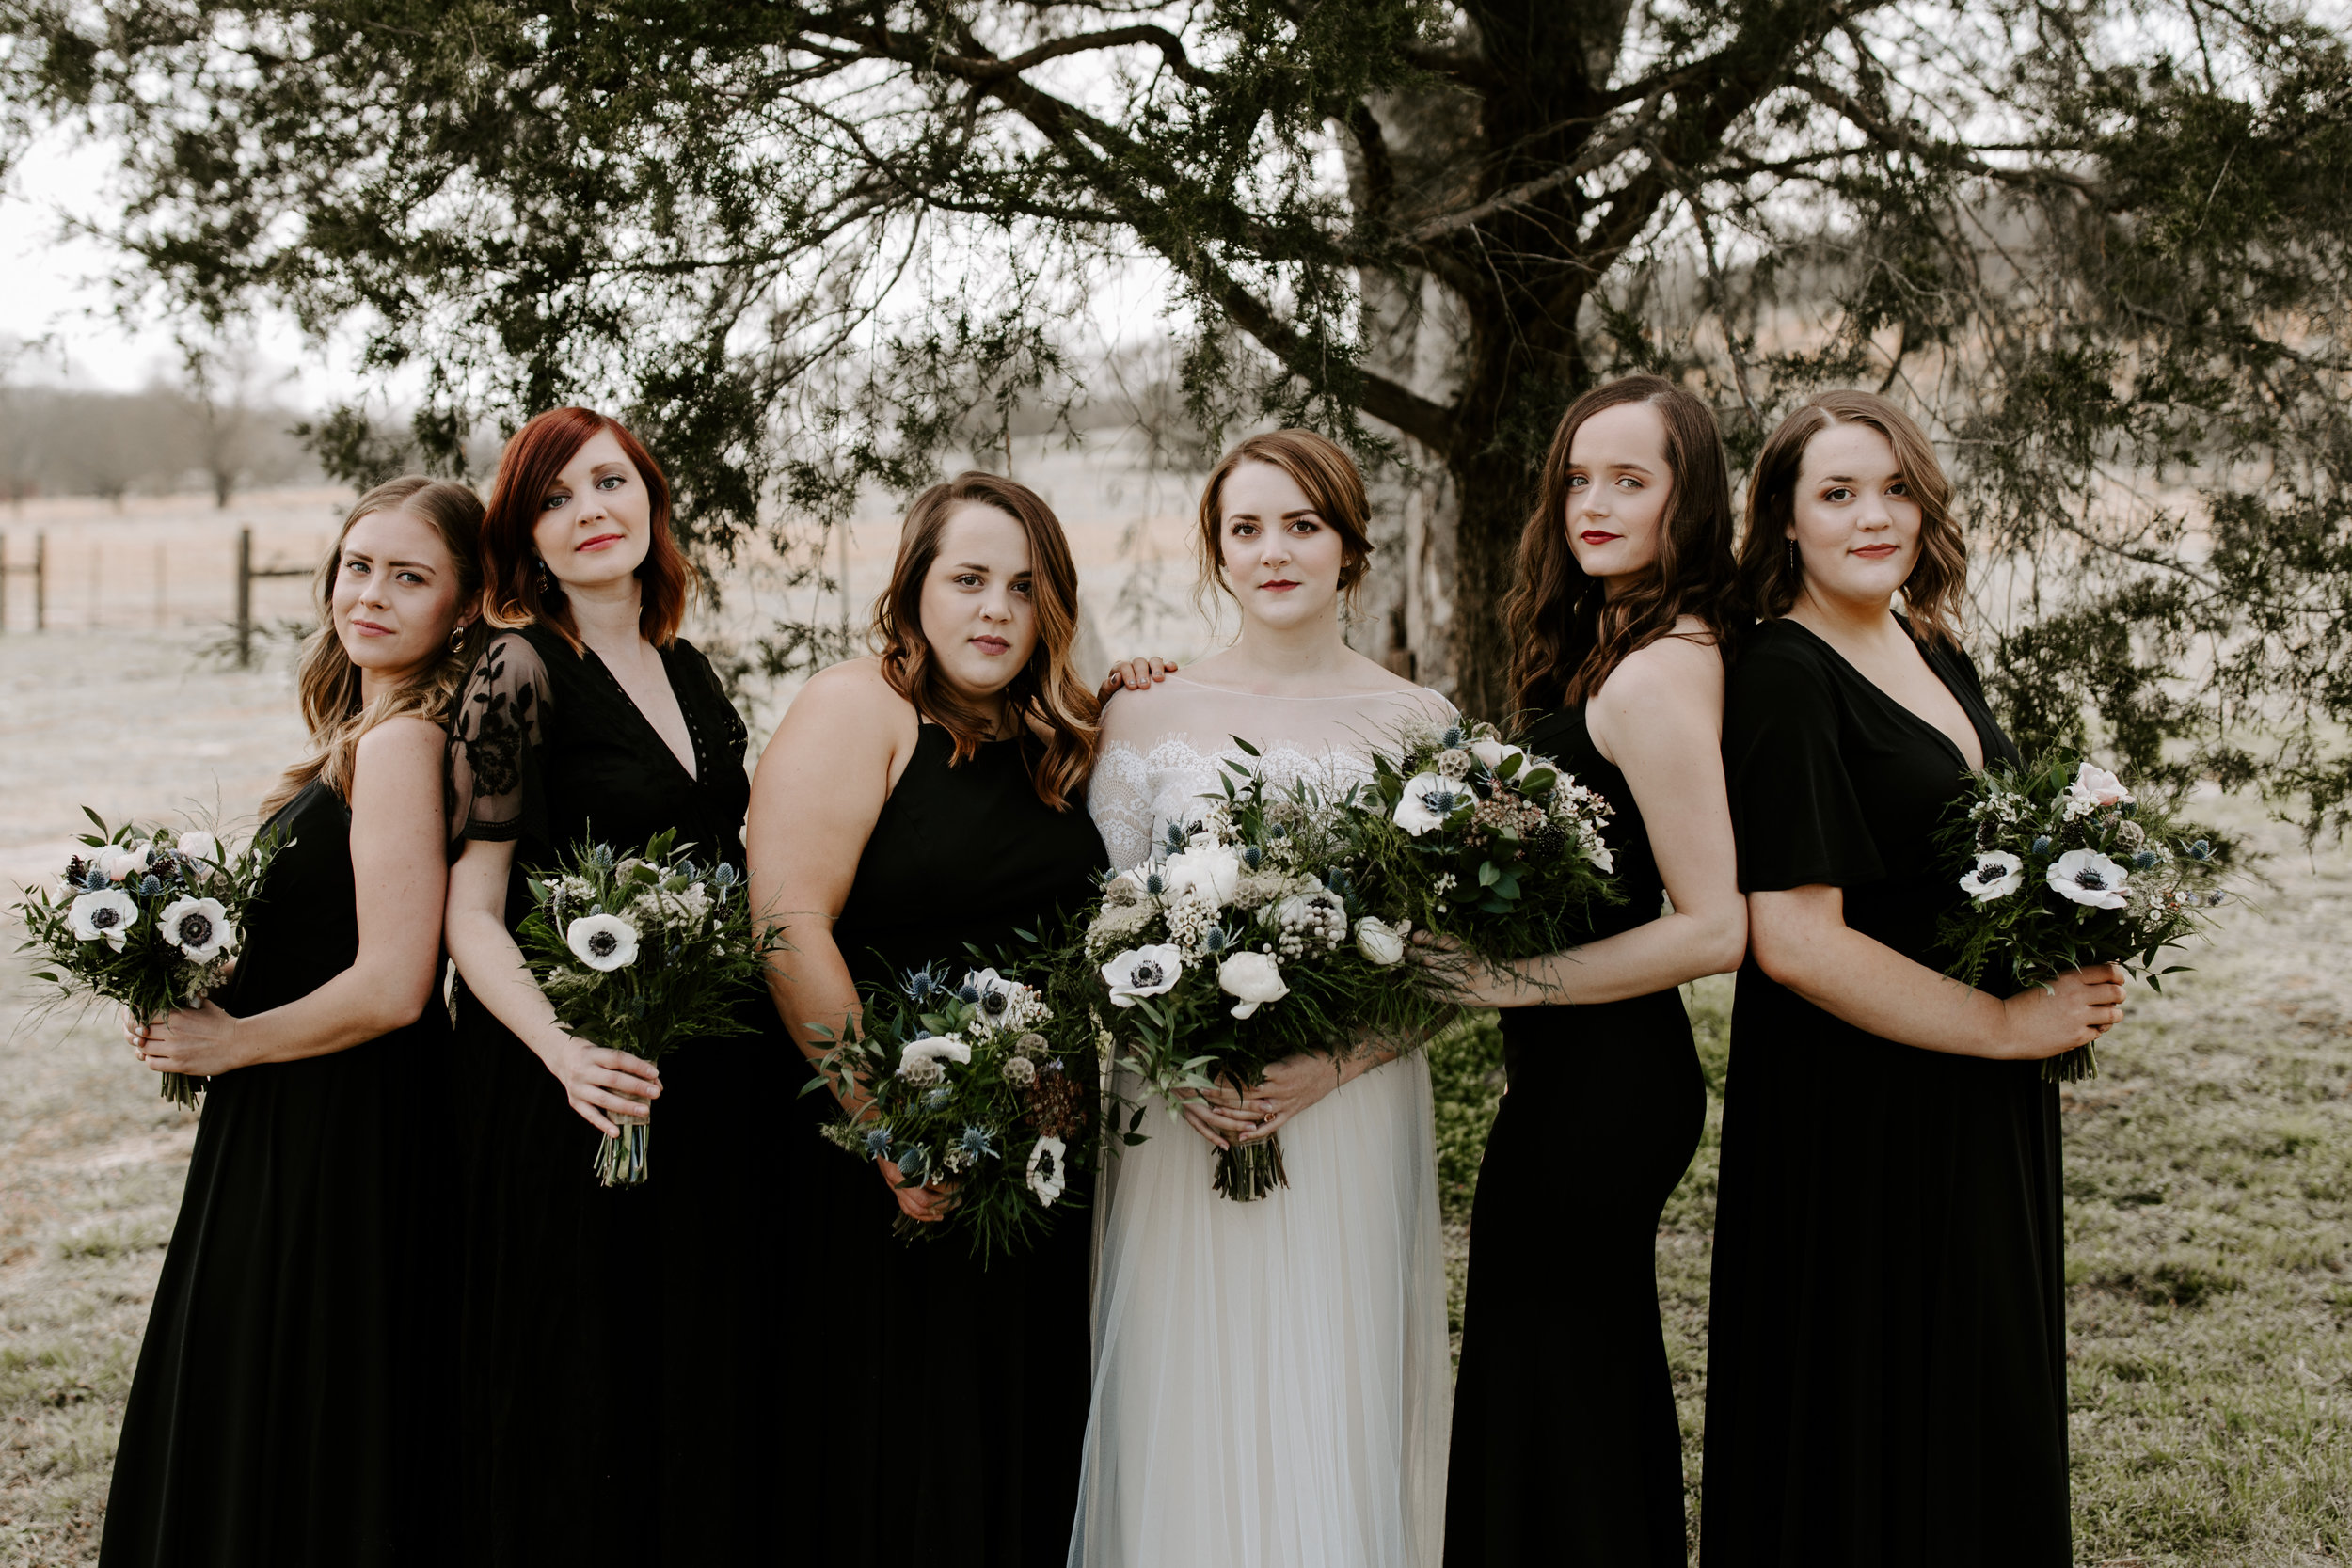 Moody Black Bridesmaids Dresses